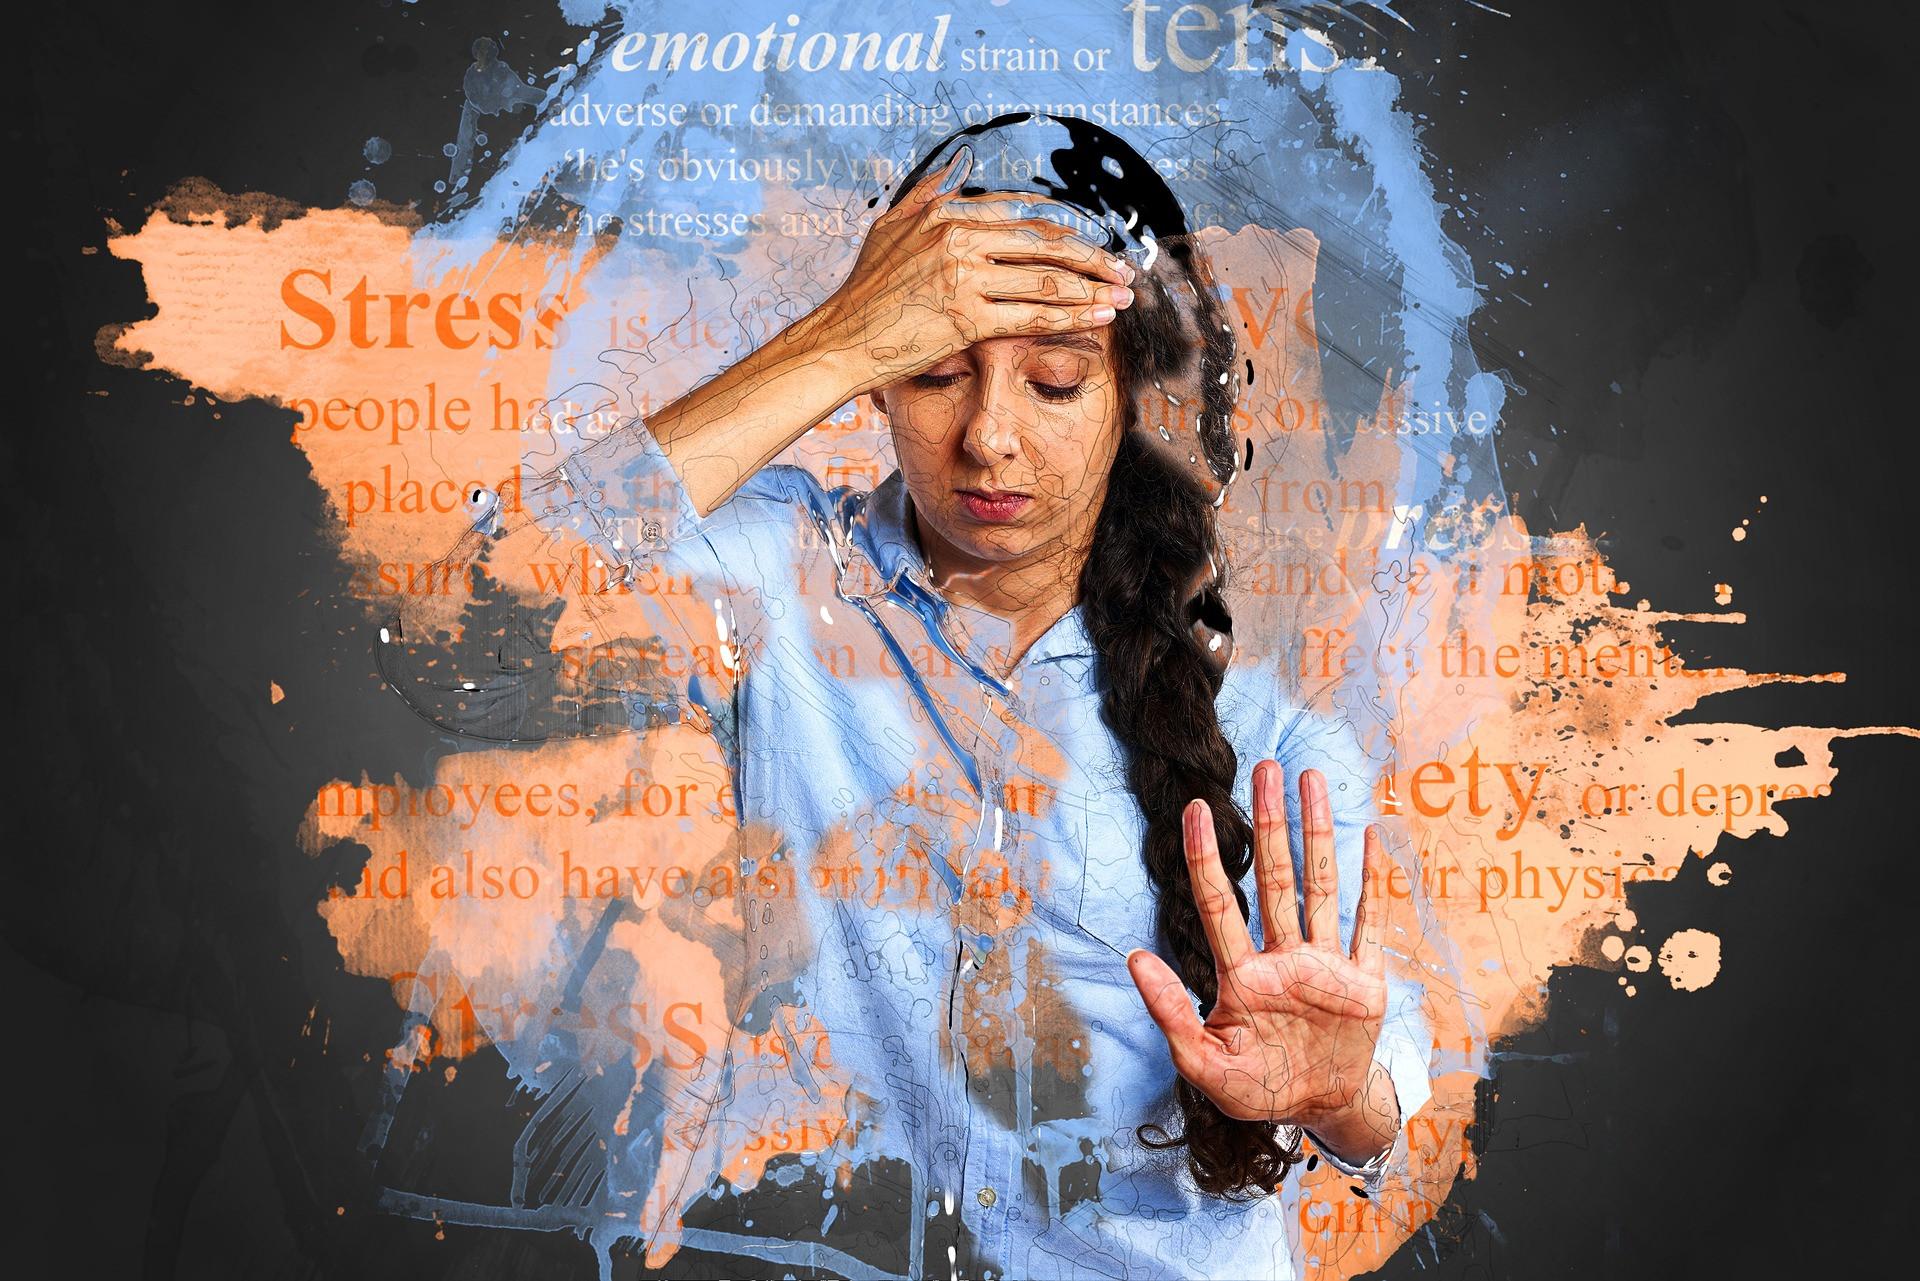 Mental Health is still a taboo subject